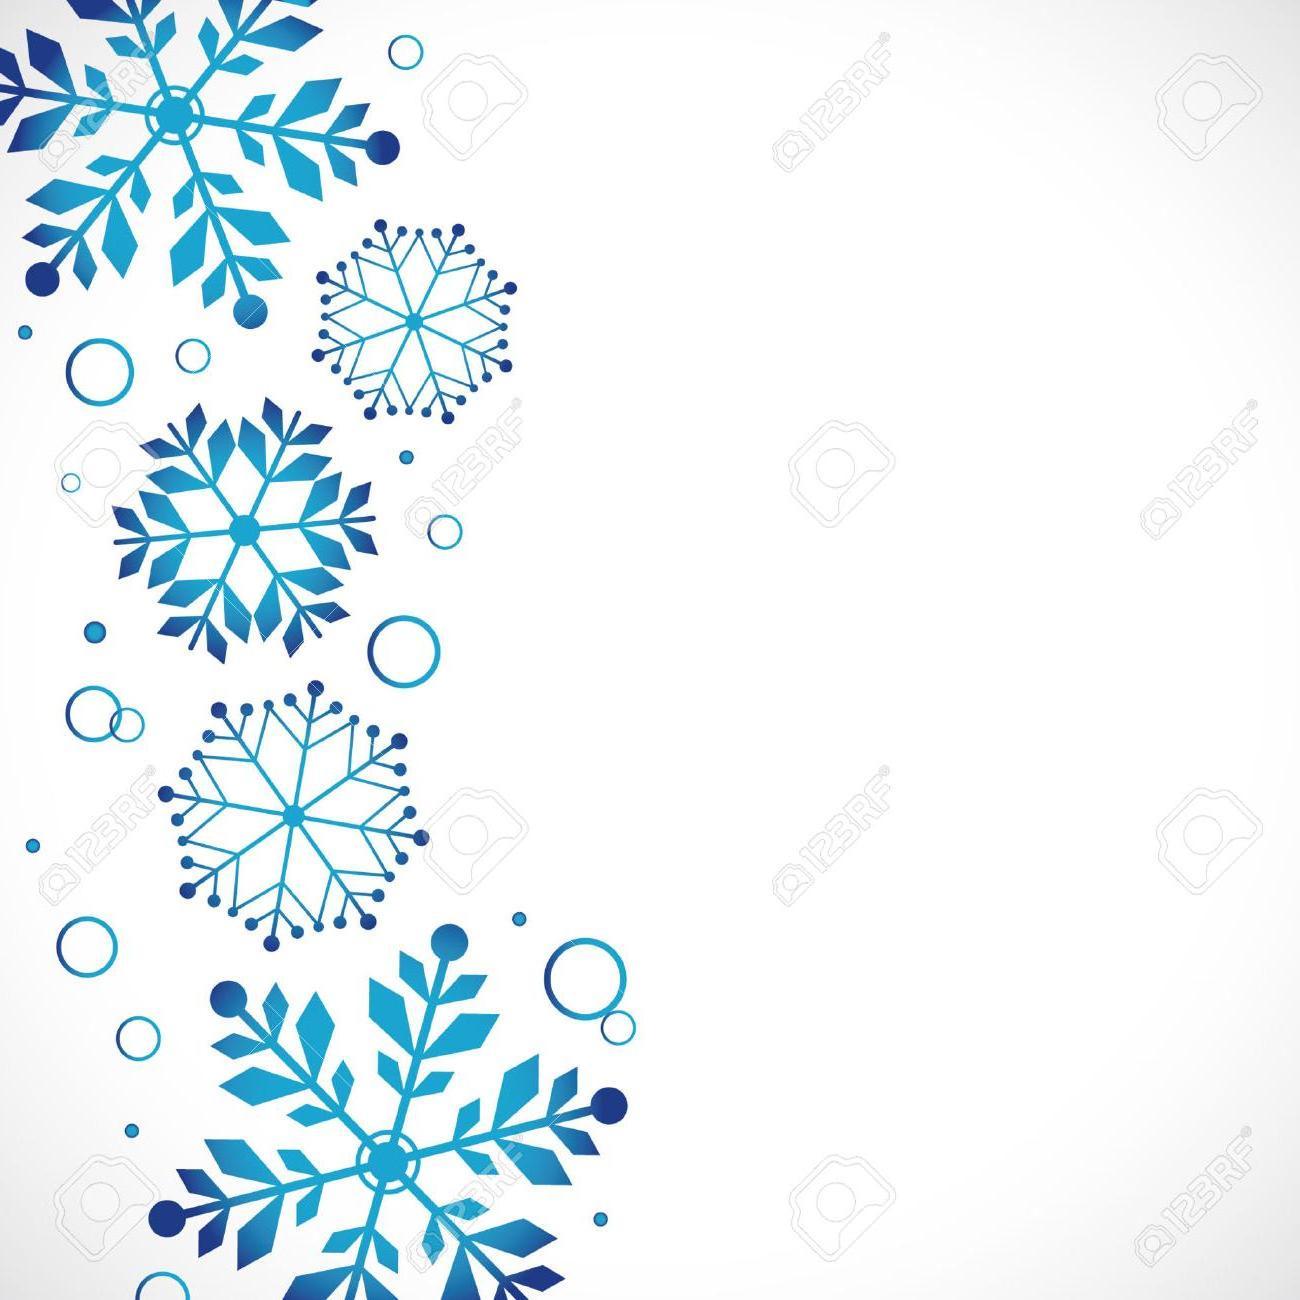 HD Winter Snowflake Border Vector Design » Free Vector Art.